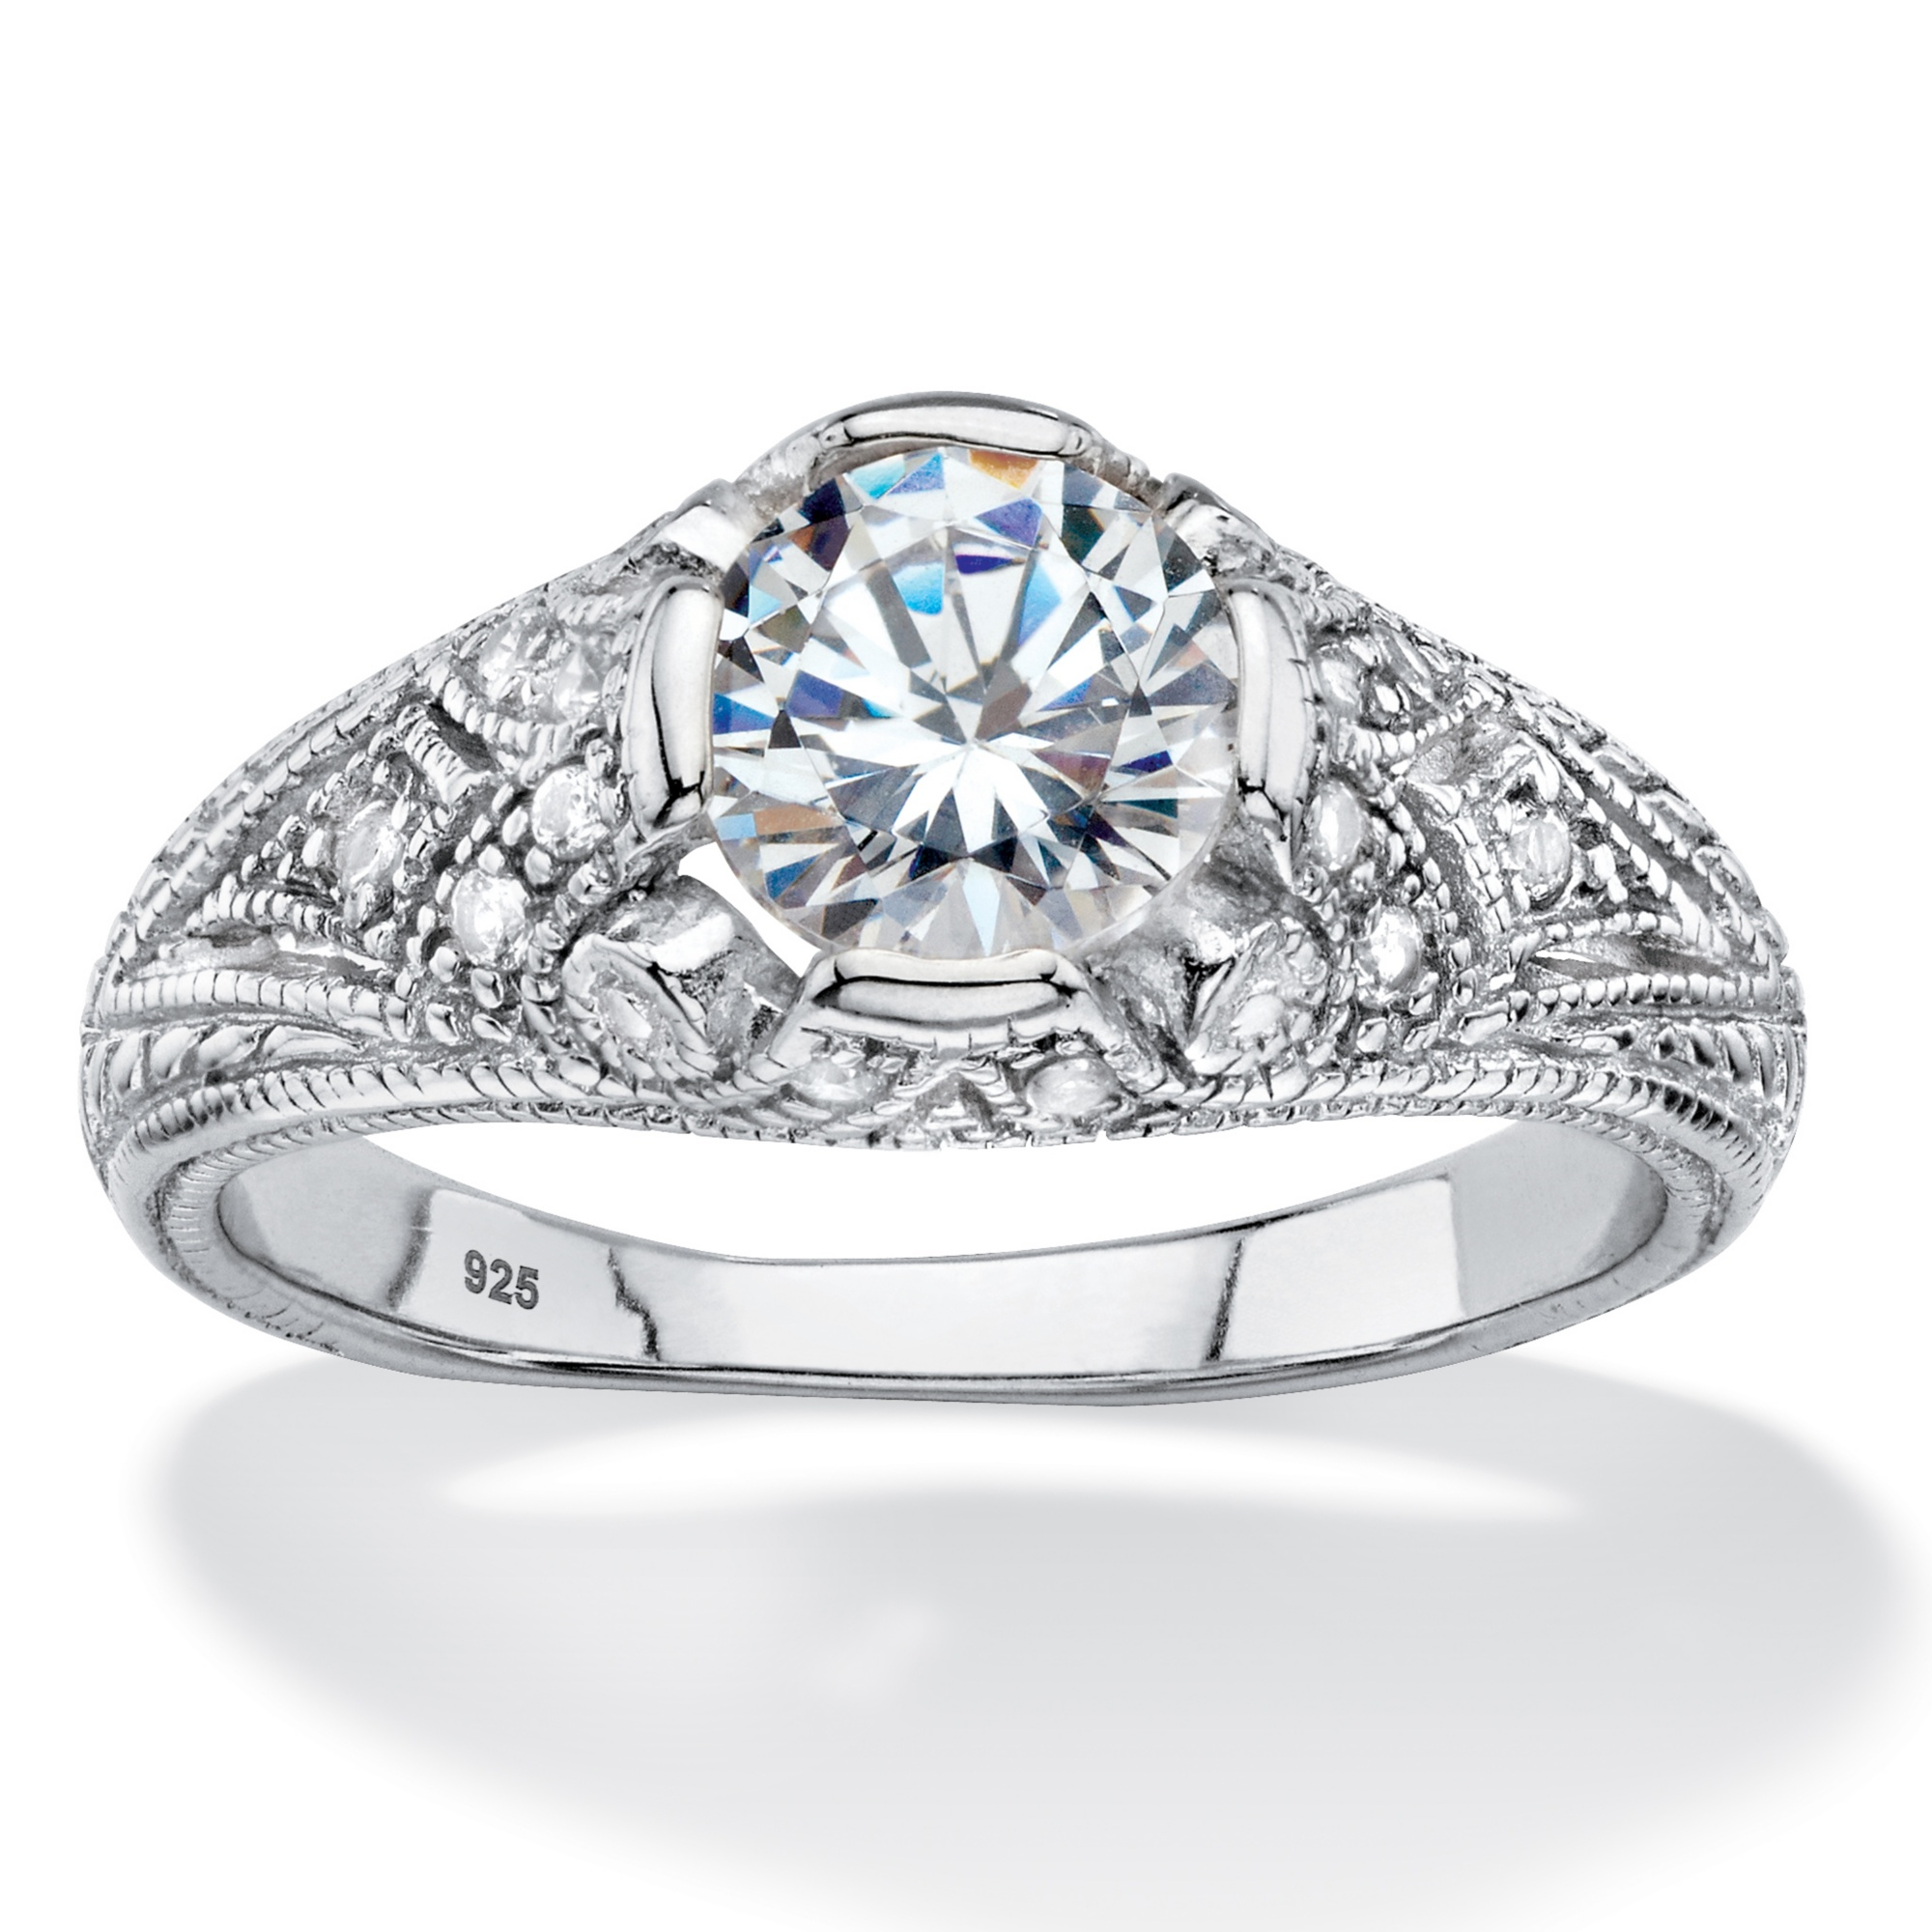 175 Tcw Round Cubic Zirconia Vintage Style Ring In. Gunmetal Rings. Lot Small Diamond Engagement Rings. Ravi Name Engagement Rings. Moon Rock Wedding Rings. Catholic Rings. Wife Bill Gates Engagement Rings. Nidhi Rings. 2.6 Carat Wedding Rings